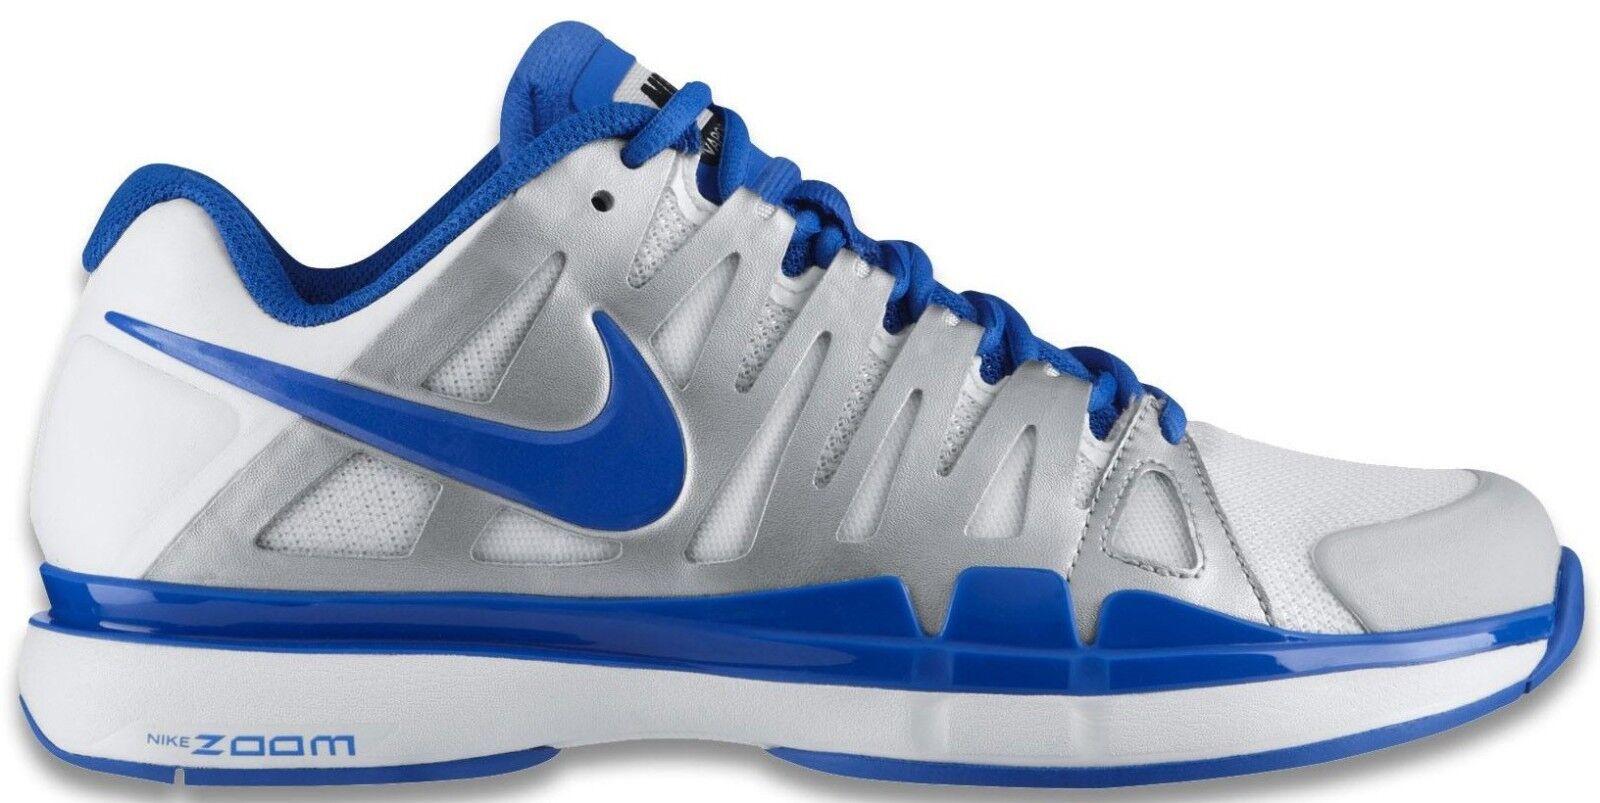 NIB Nike Federer ZOOM VAPOR 9 TOUR White/Blue Tennis Shoes 488000-140 Sz: 8.0